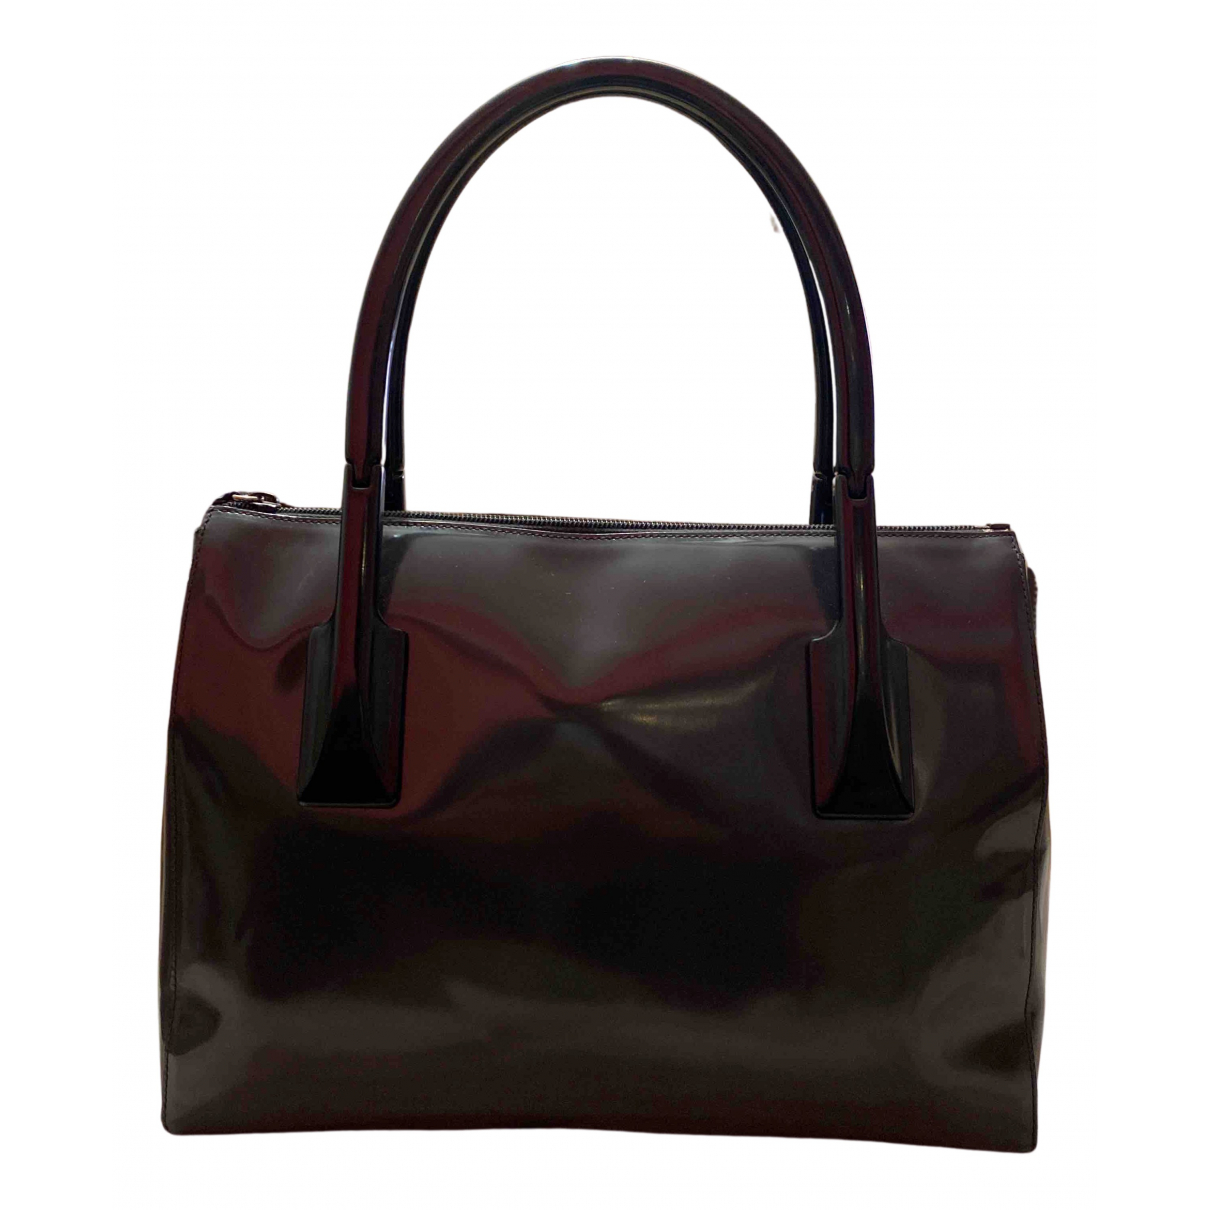 Prada Esplanade Handtasche in  Grau Lackleder